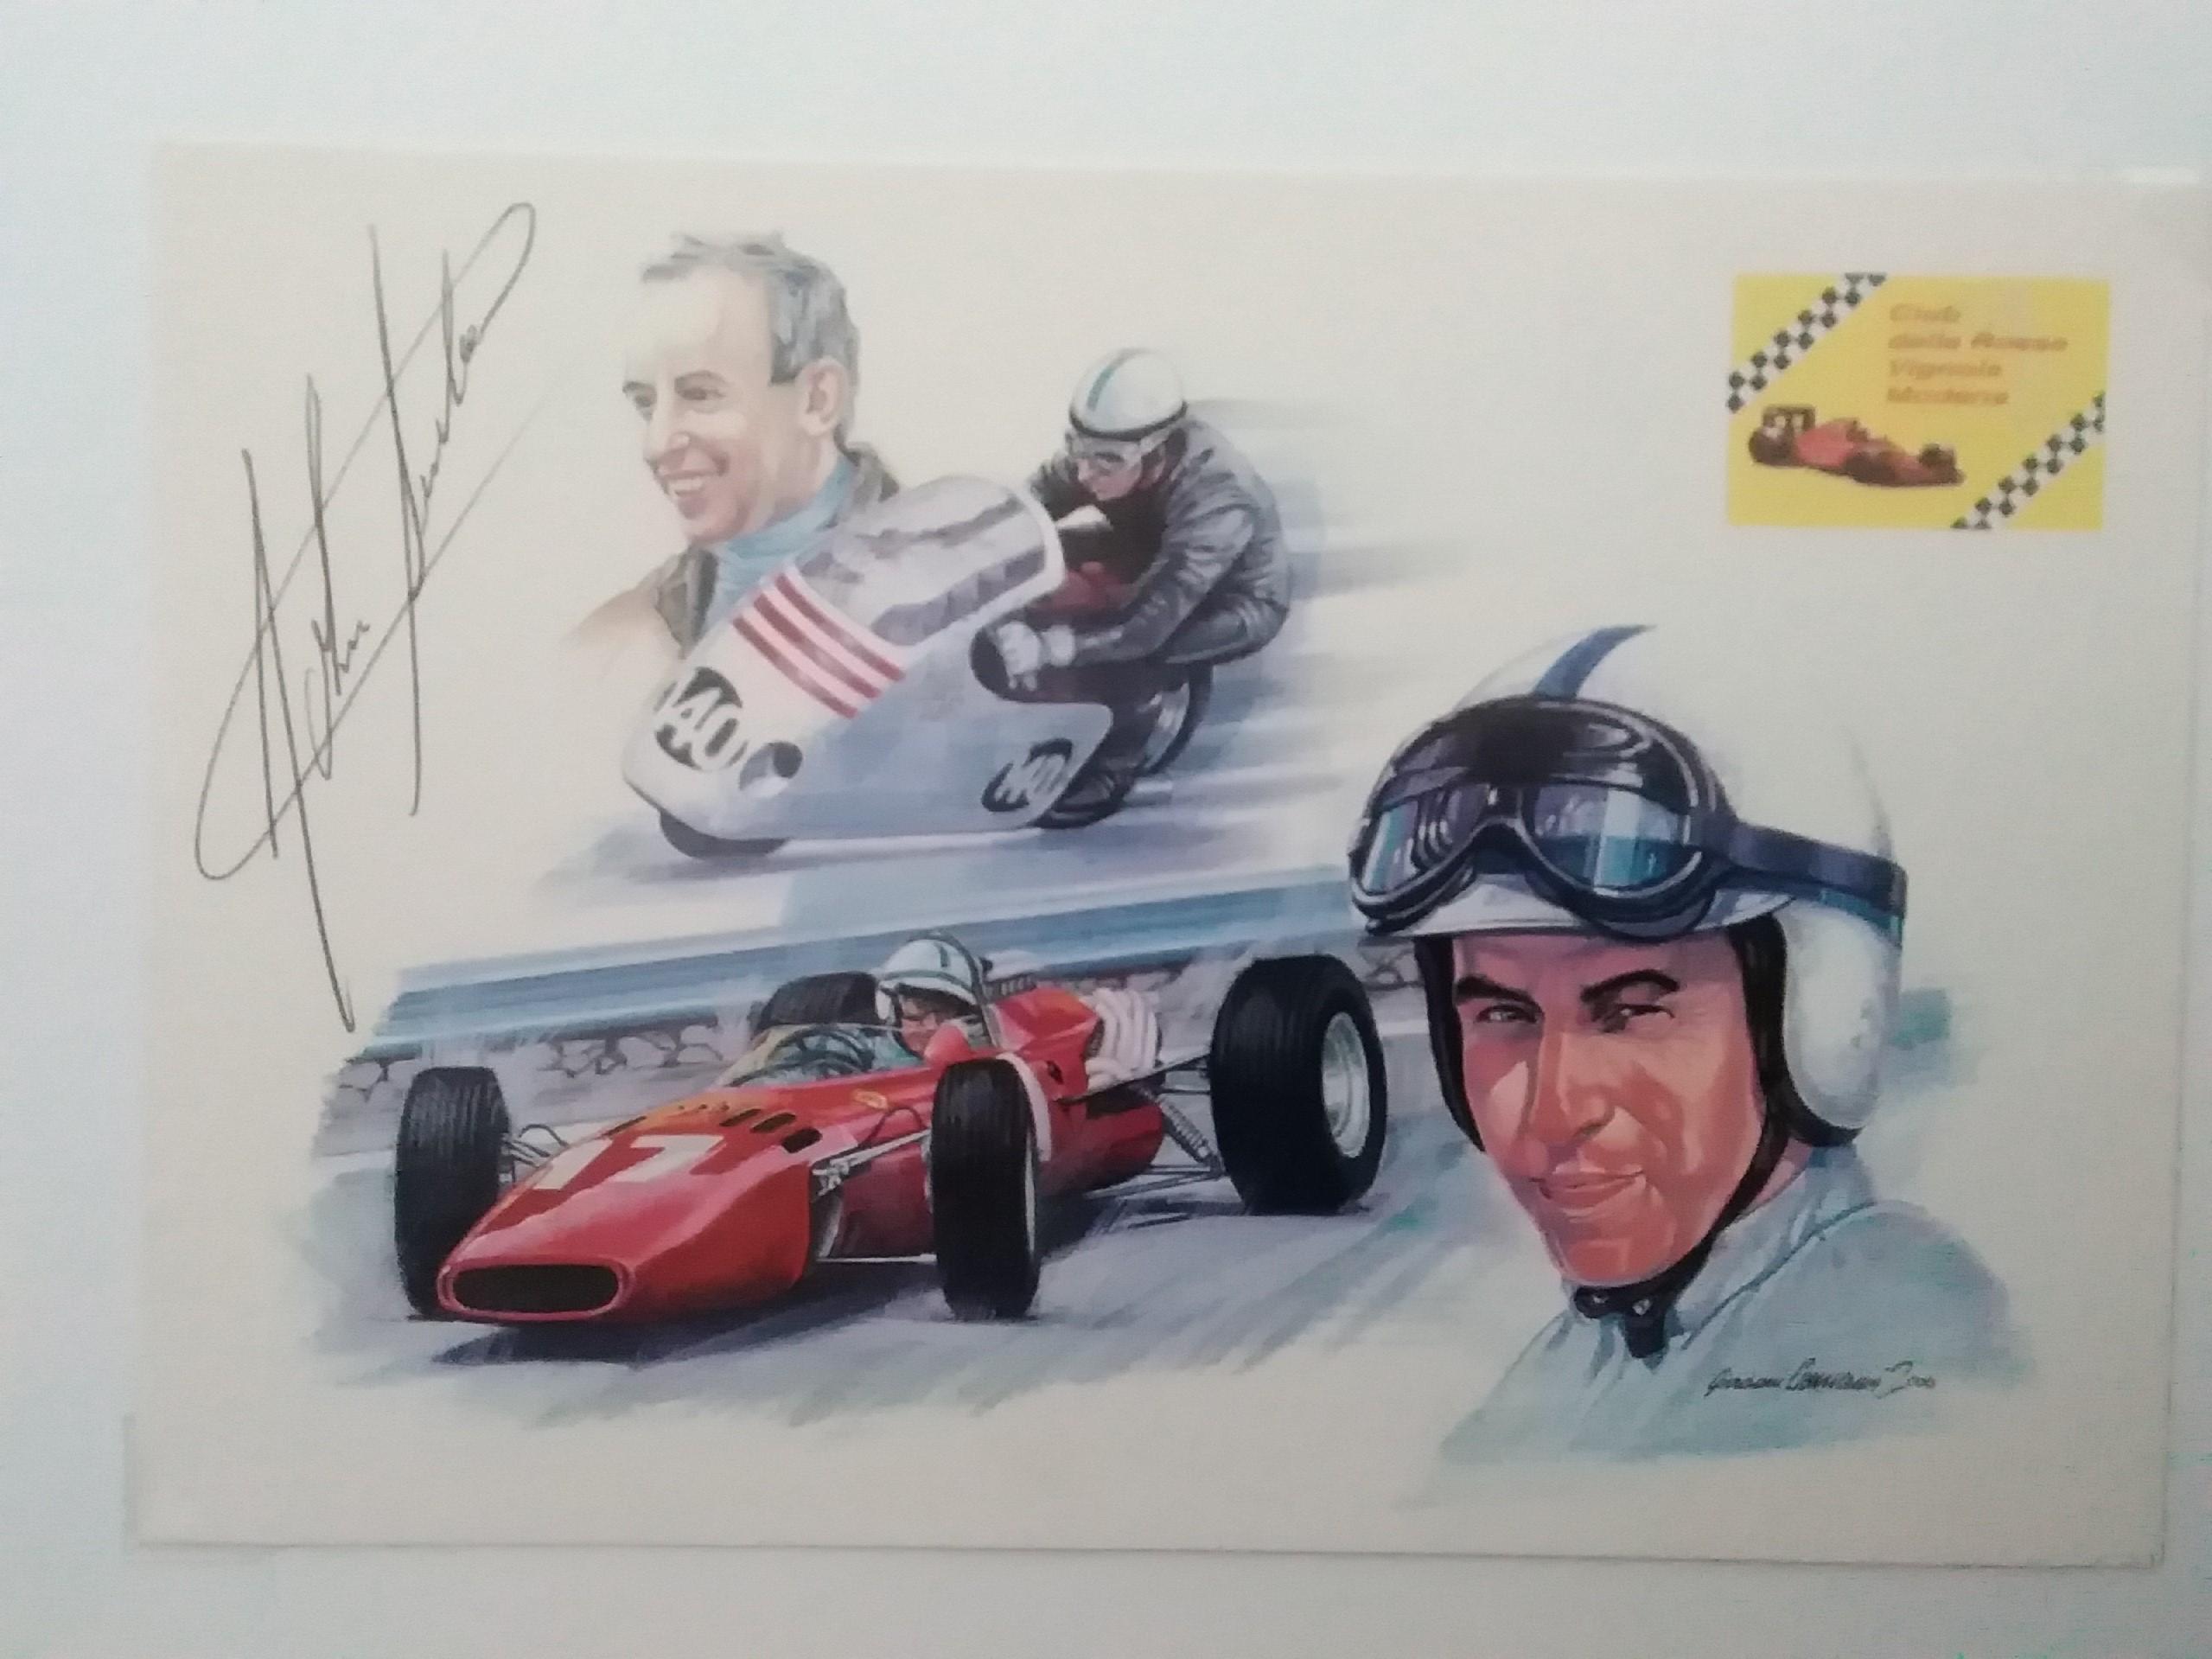 John Surtees-Montage Card-Signed